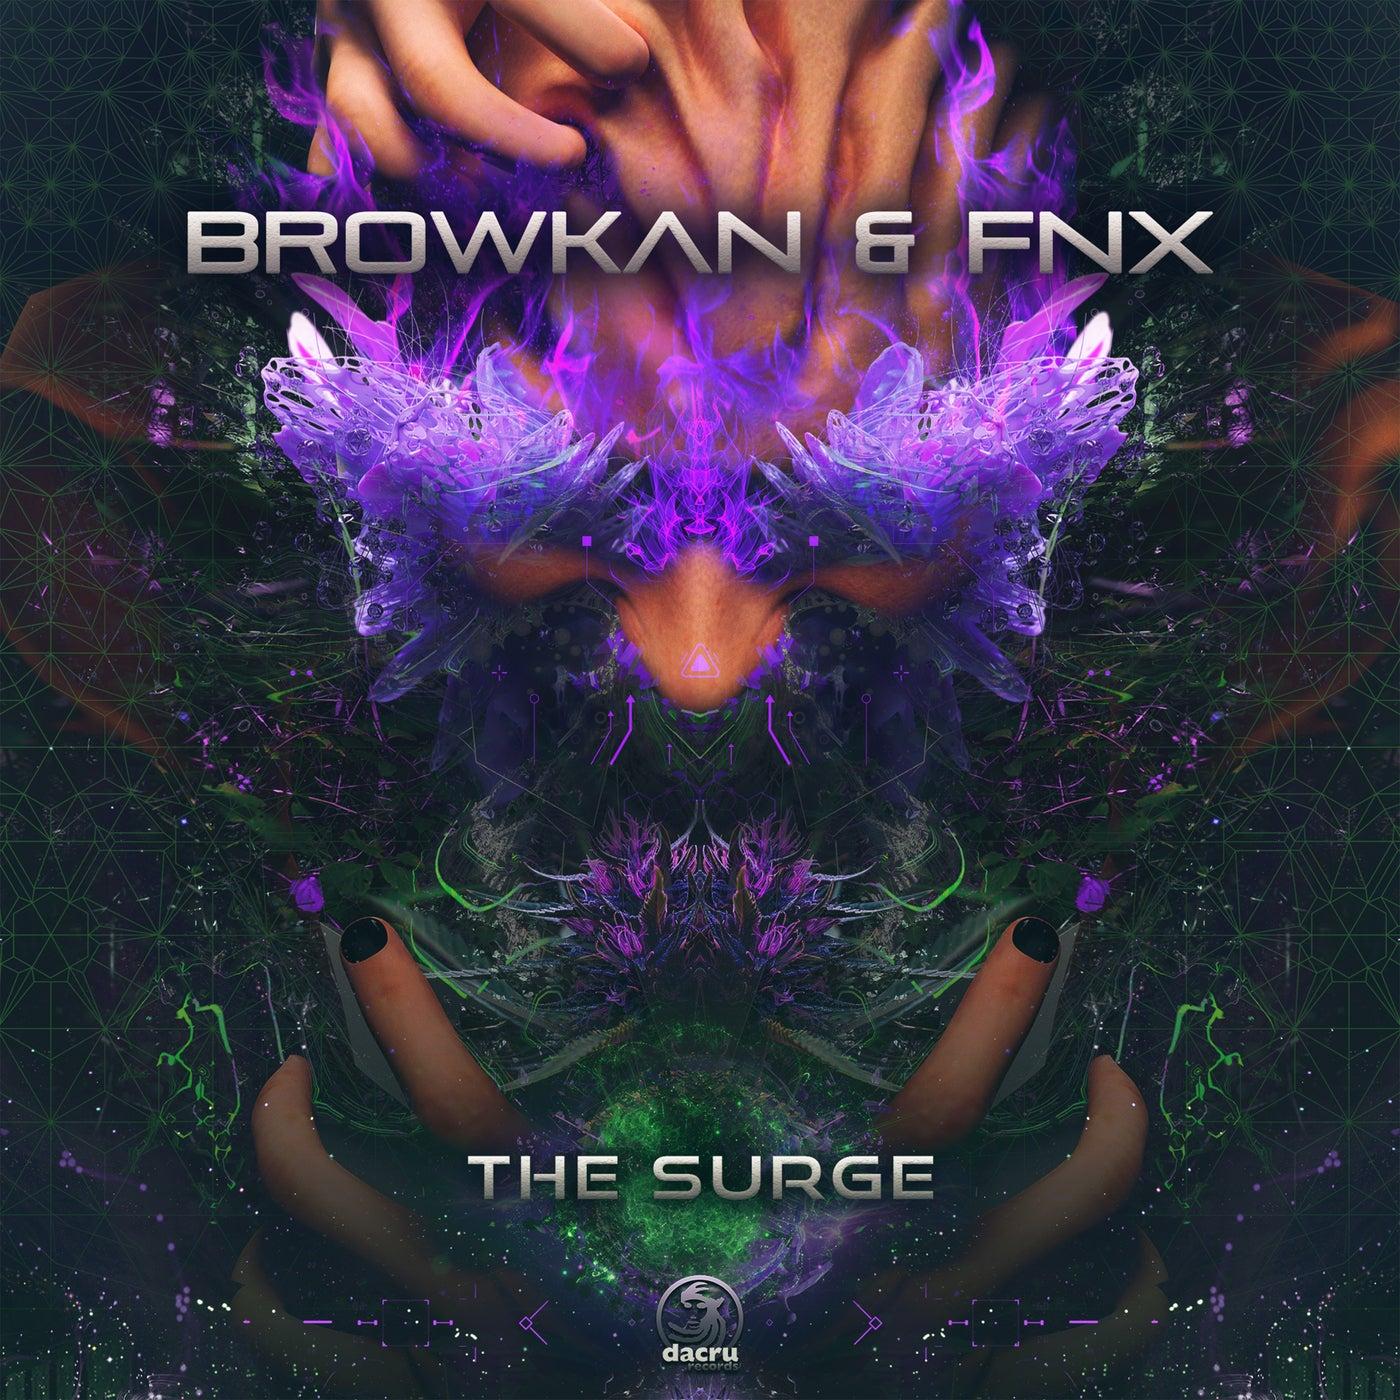 The Surge (Original Mix)